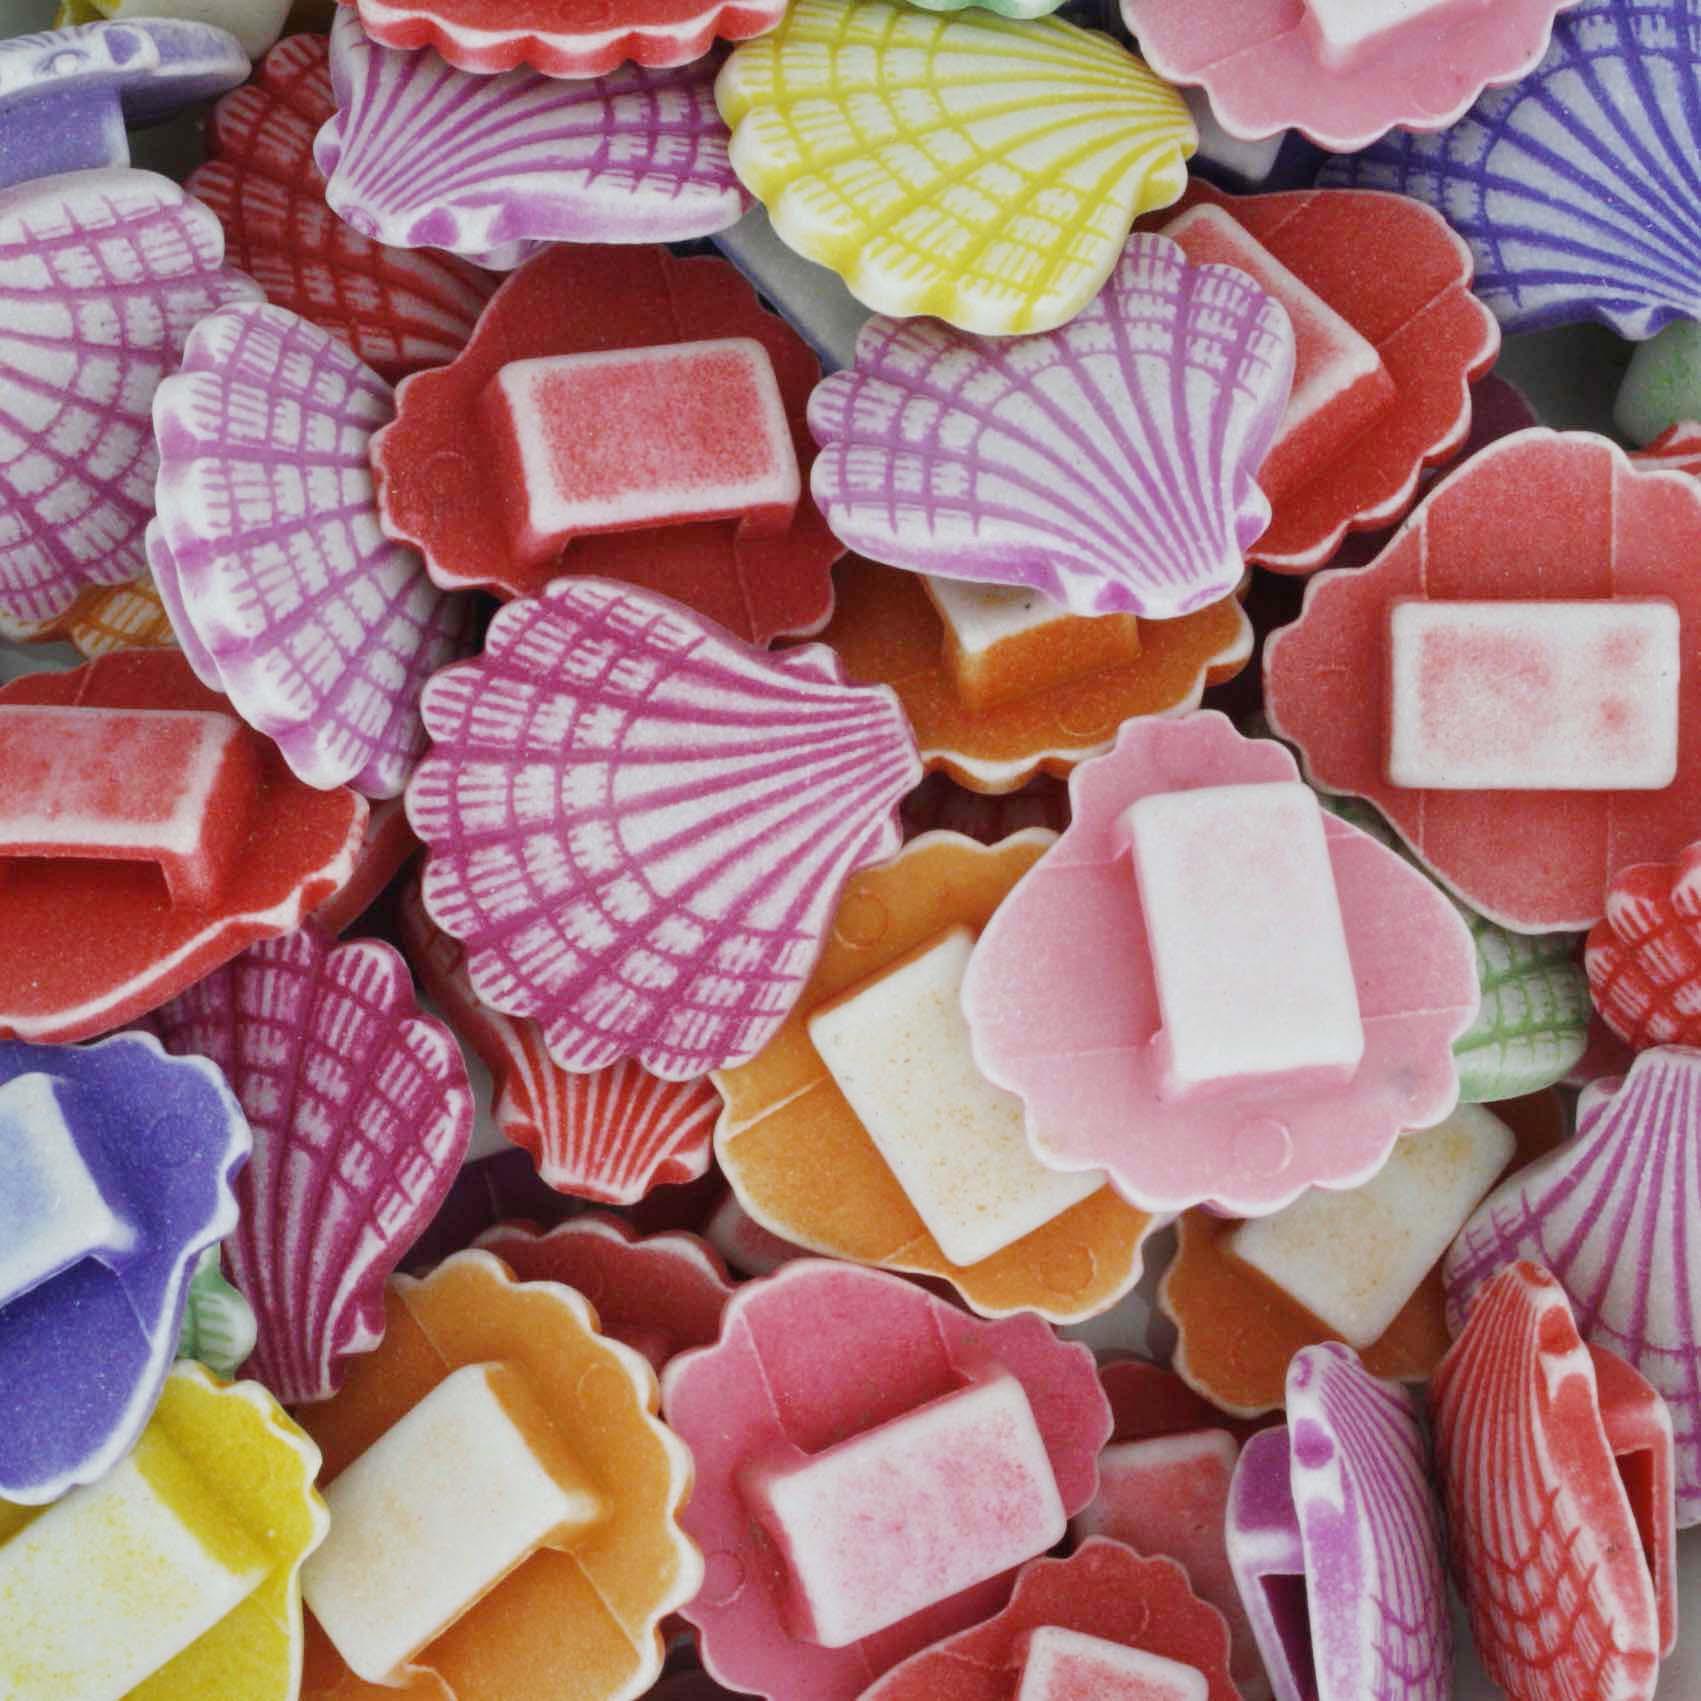 Miçanga Colorida / Infantil - Conchas Grandes  - Stéphanie Bijoux® - Peças para Bijuterias e Artesanato